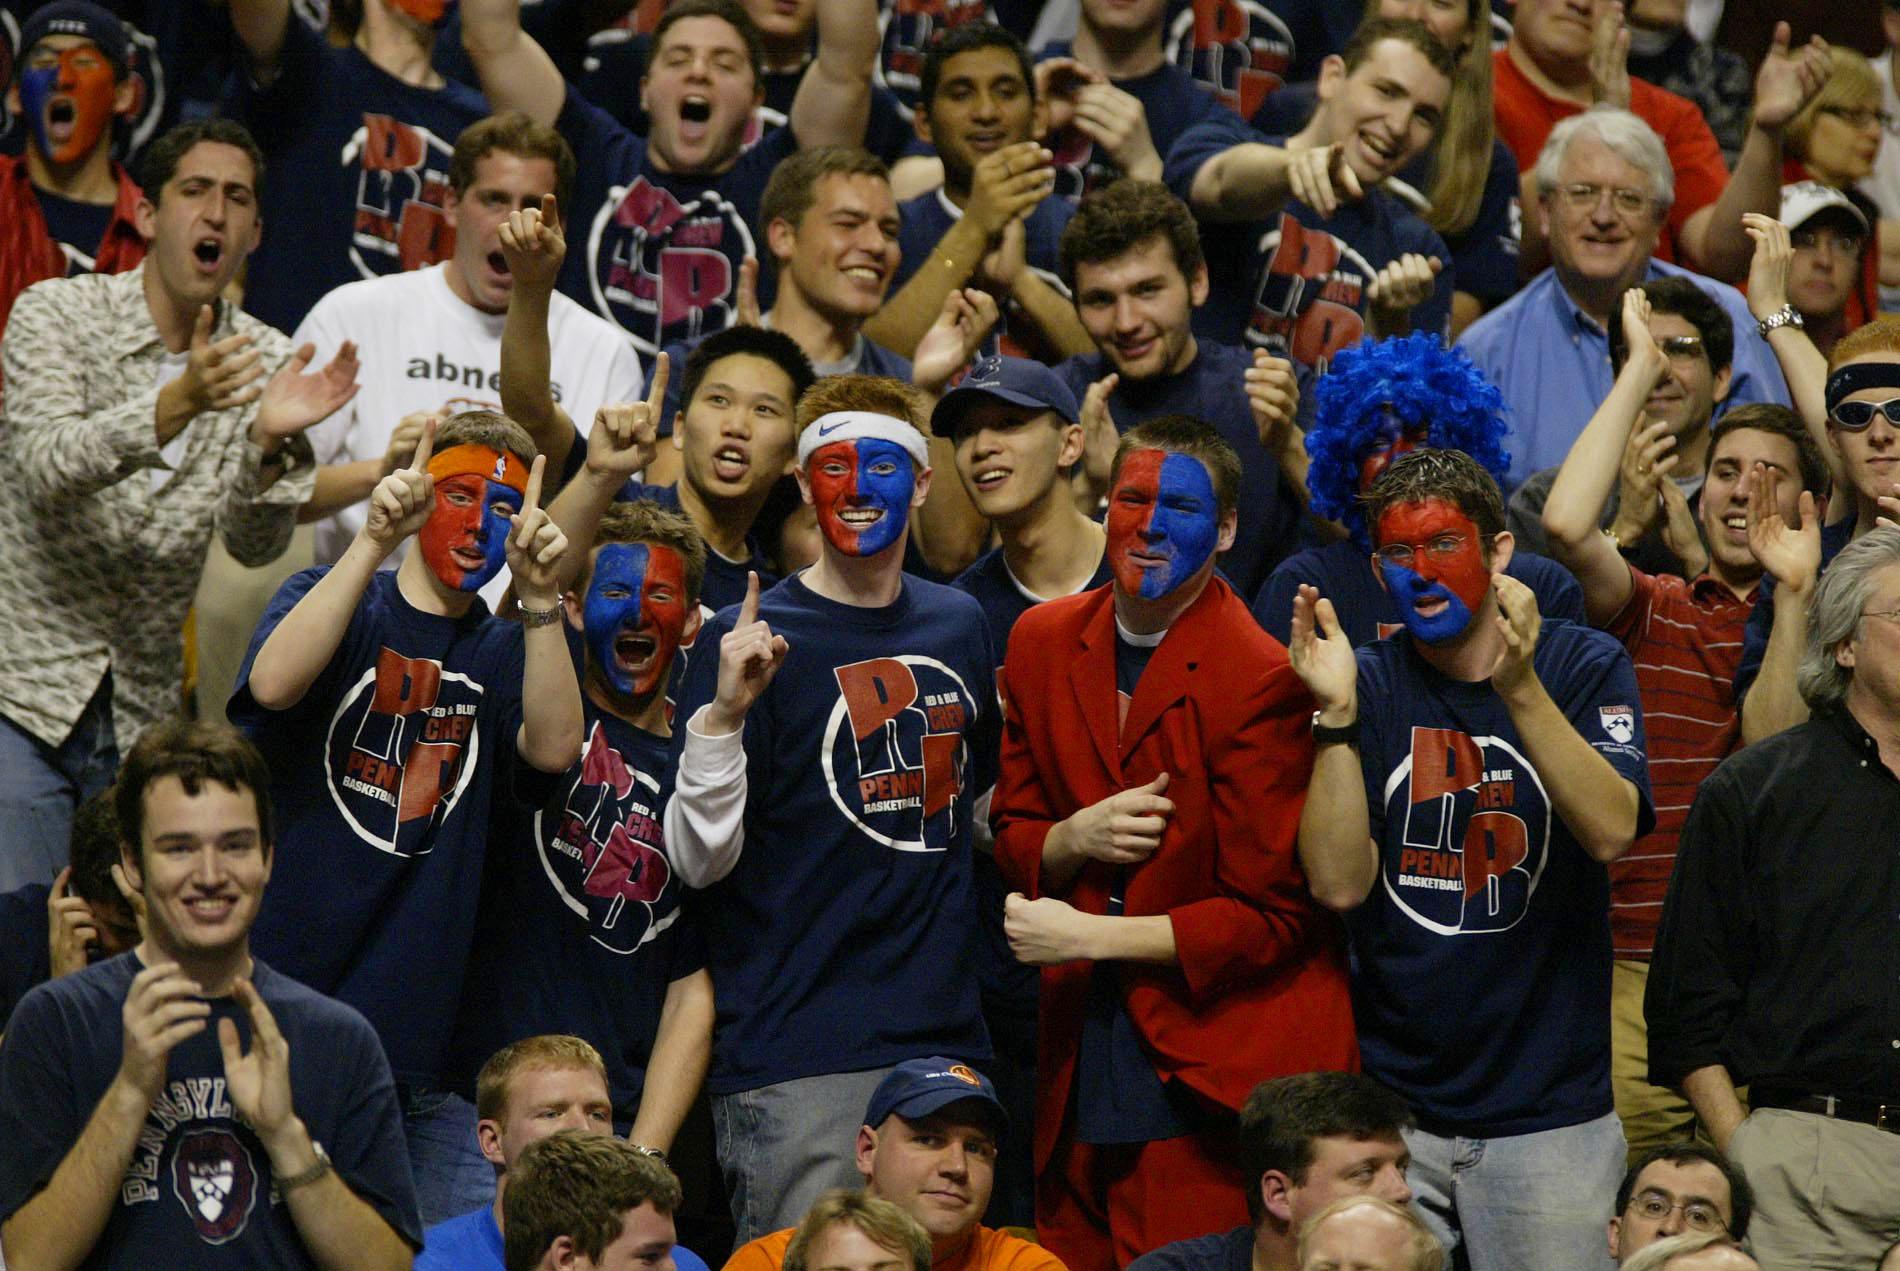 Fans cheer for their team